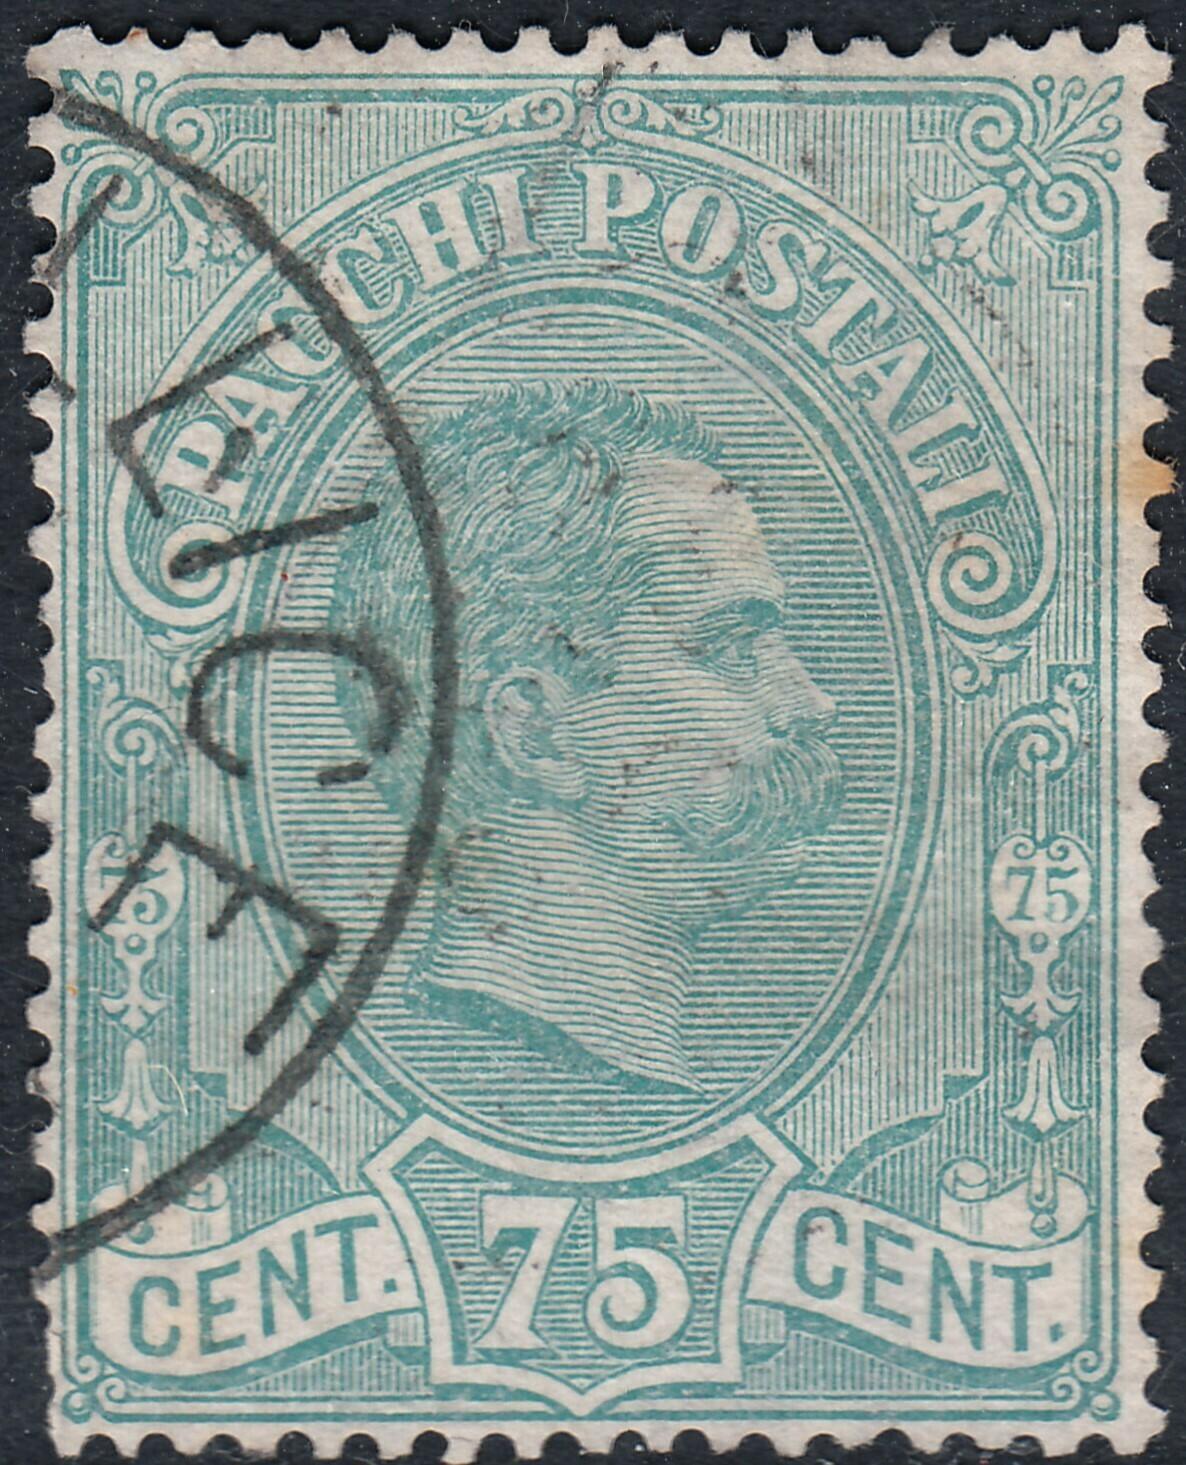 Italy 1884 75c Green Parcel Post VFU